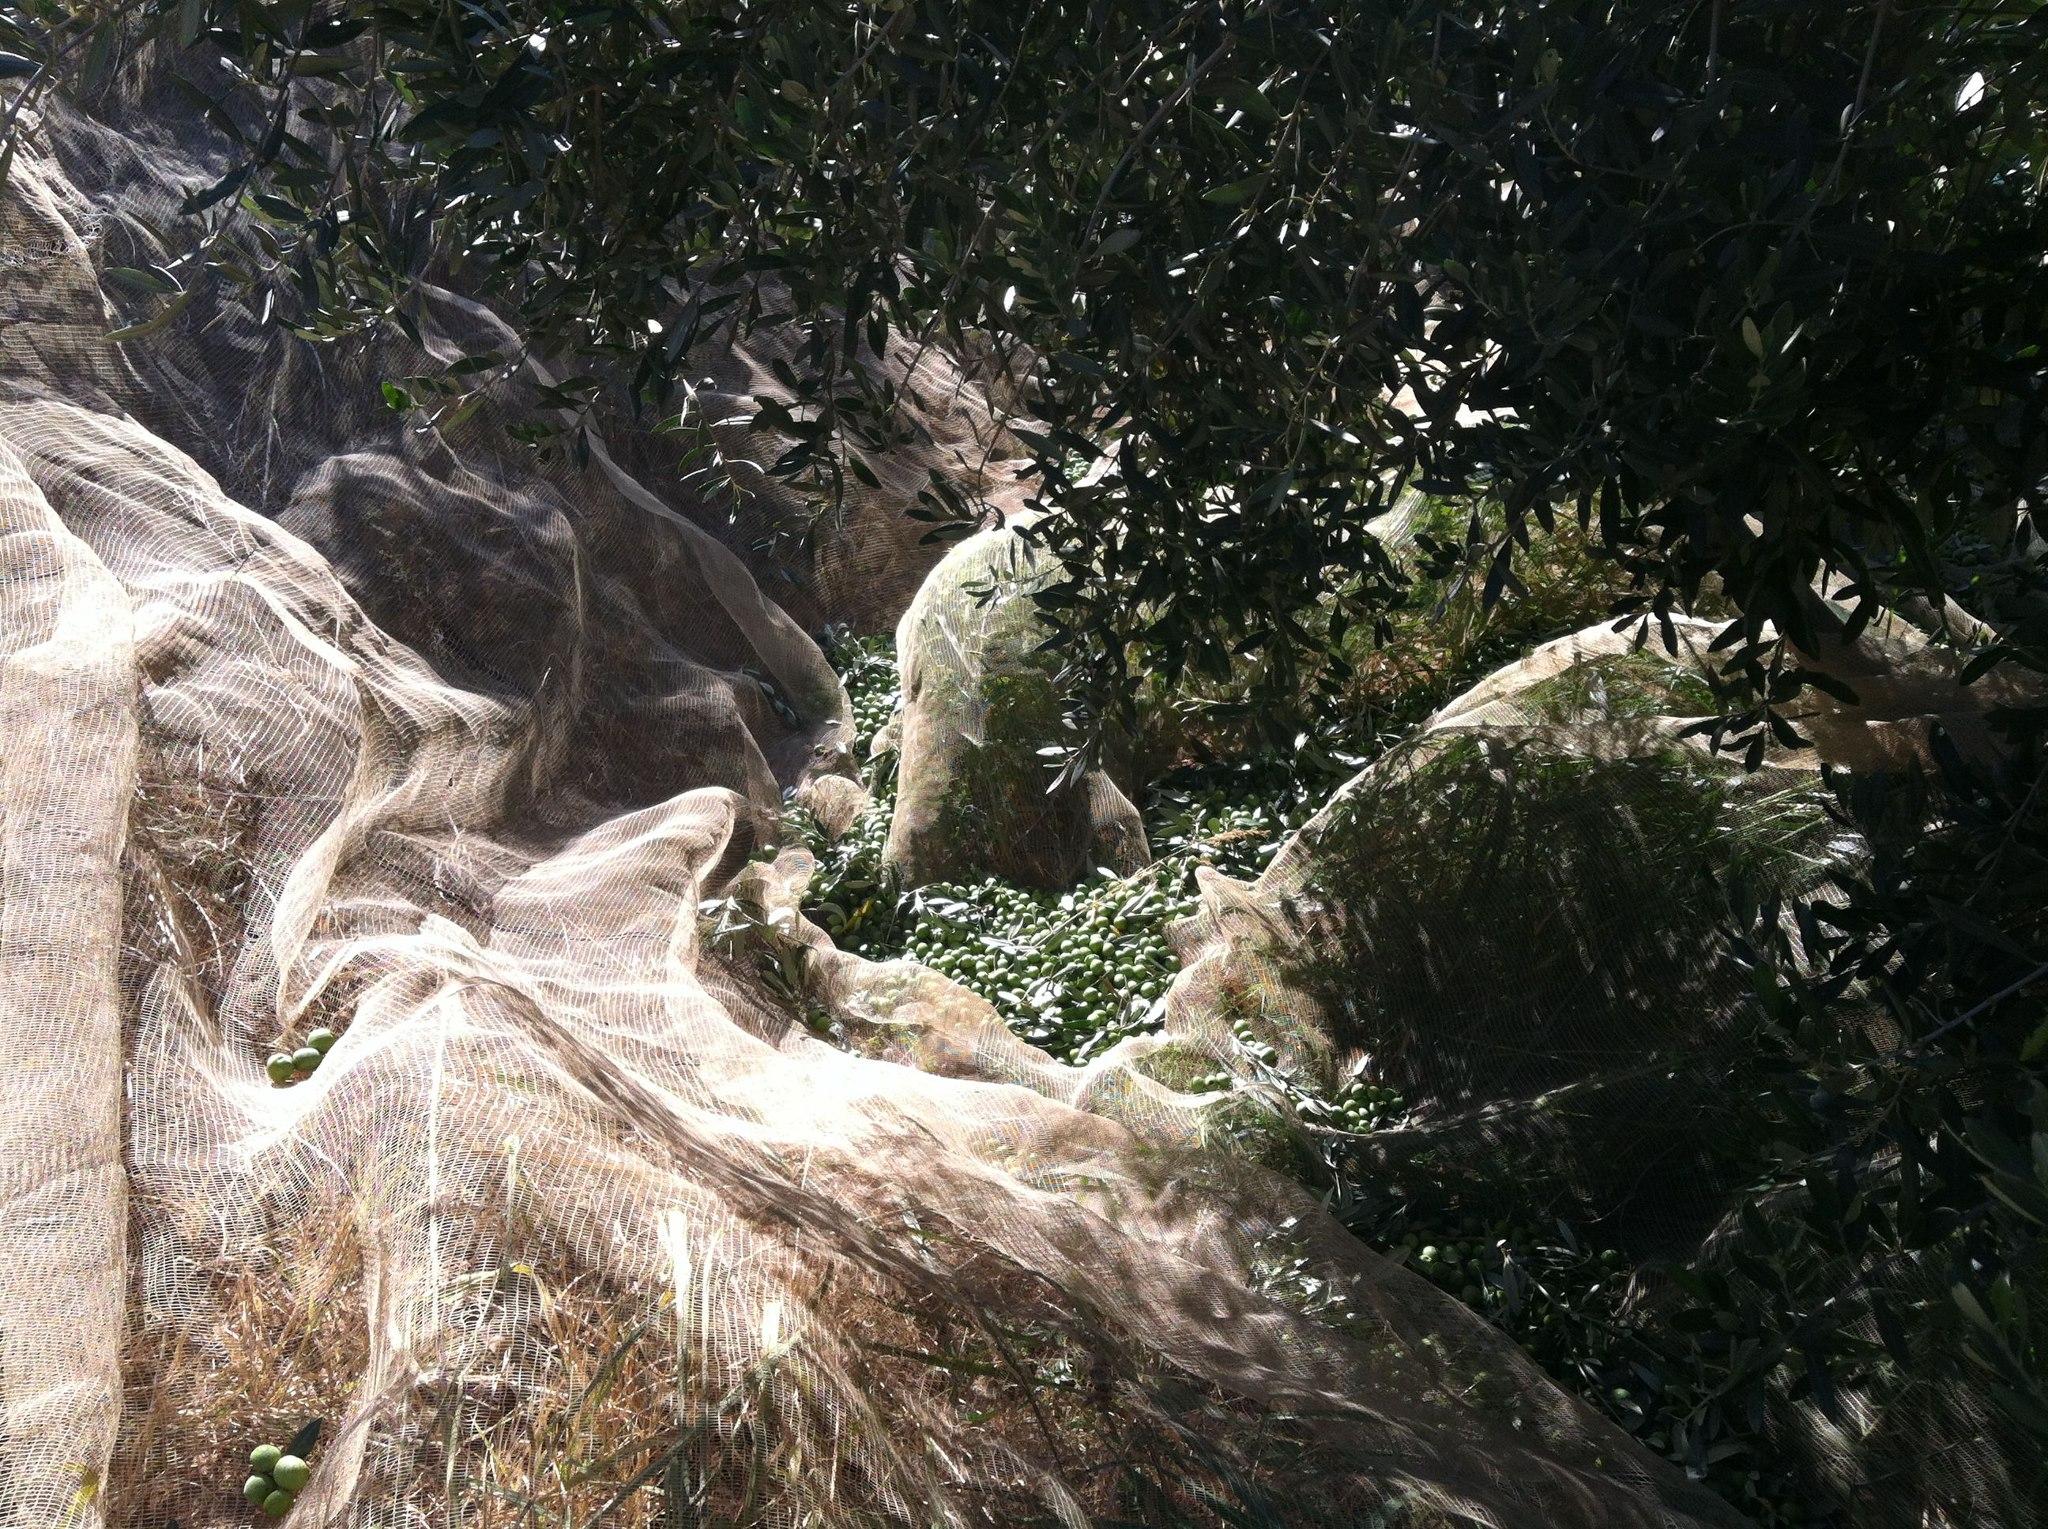 Harvesting olives at Tenute Librandi Pasquale